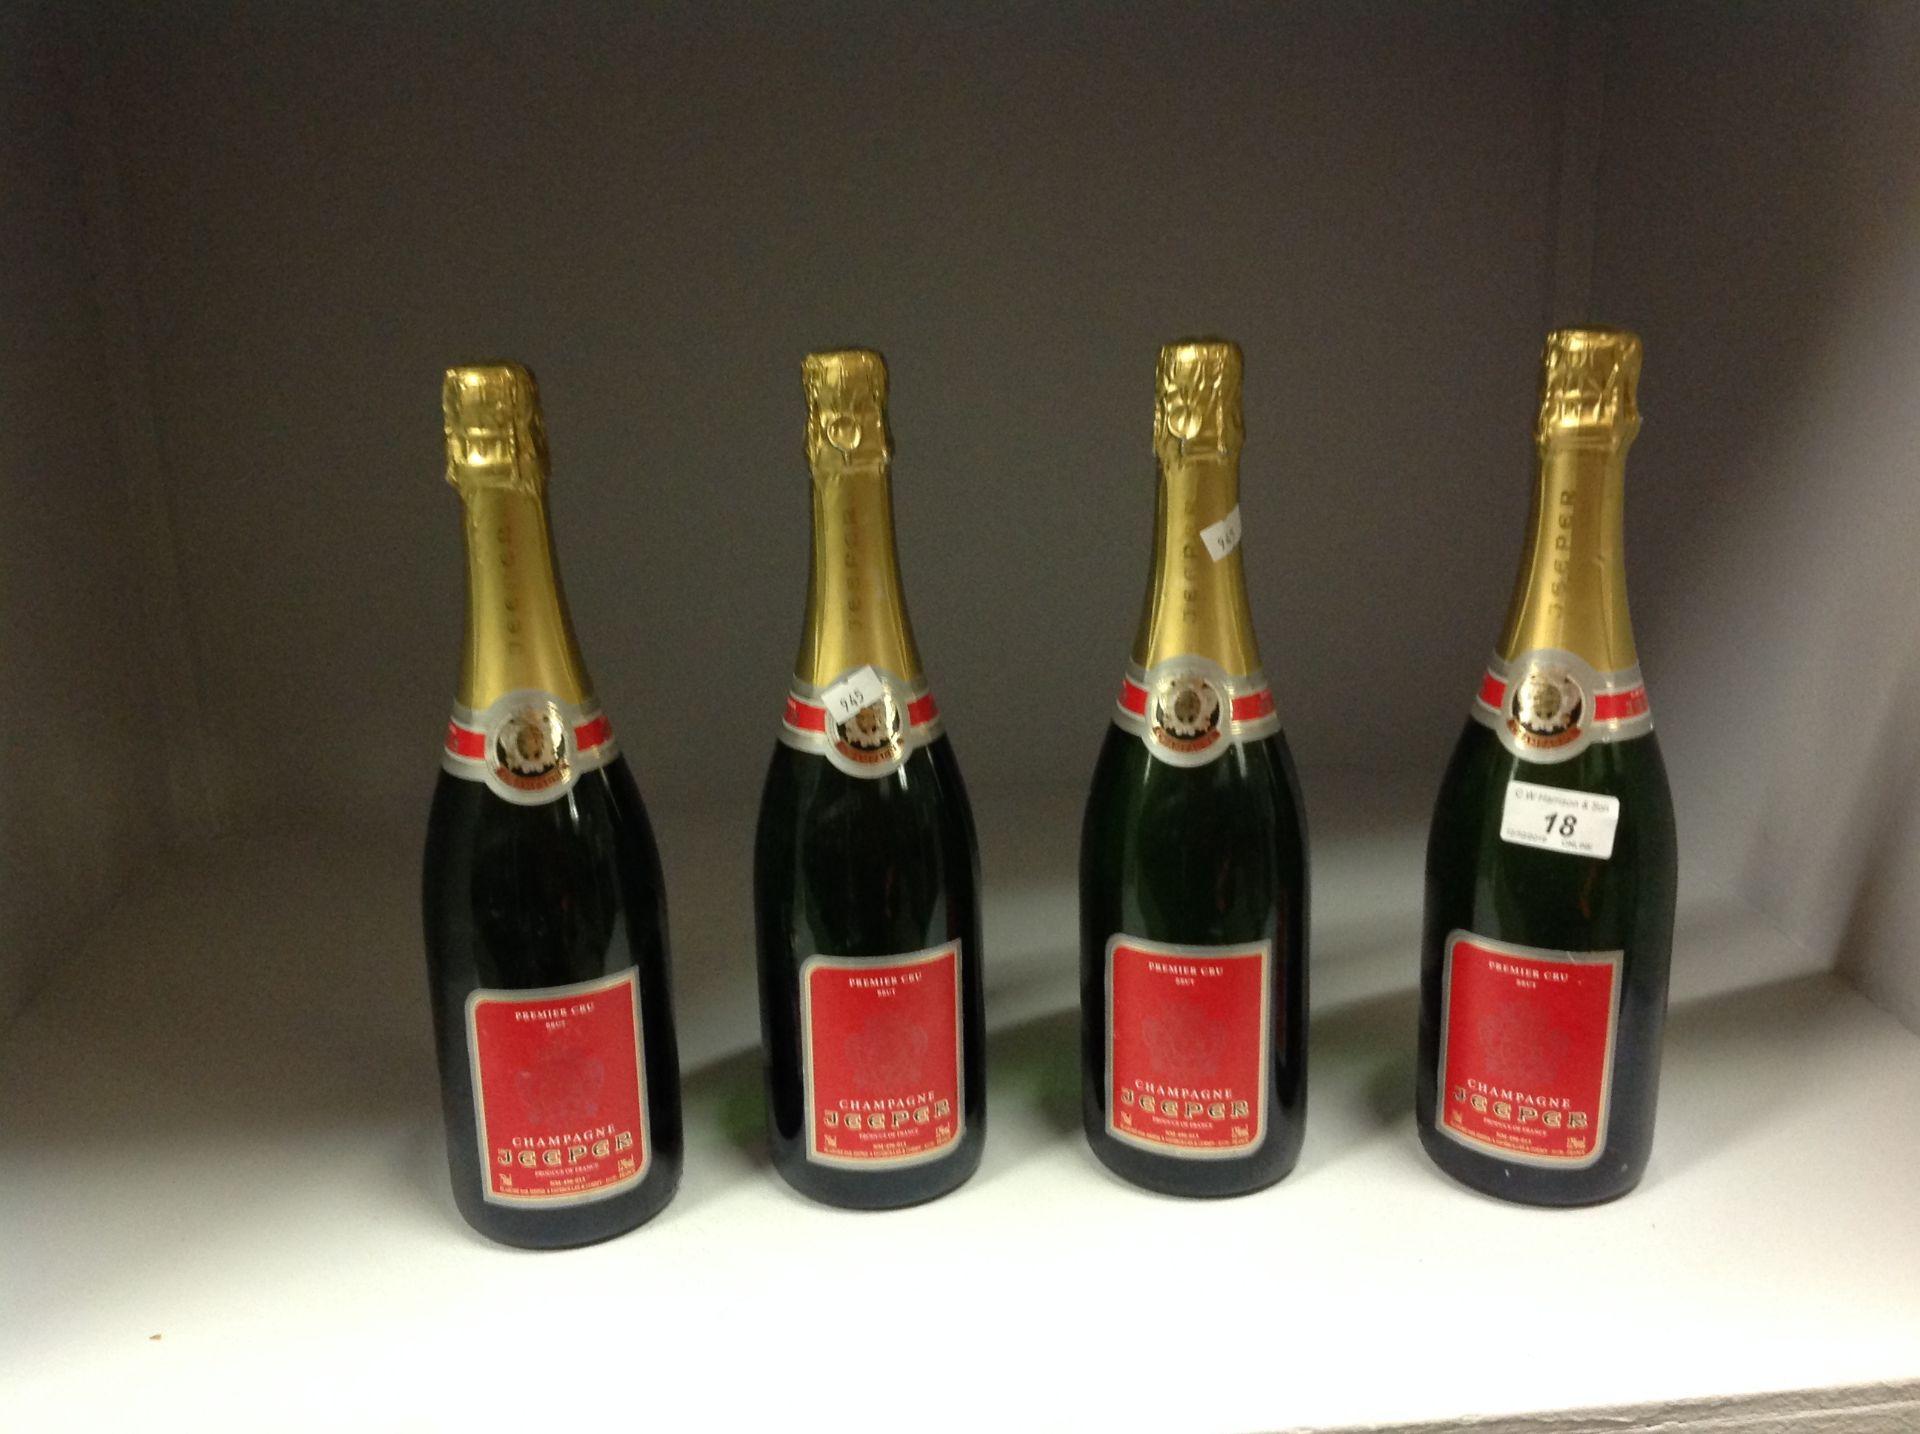 Lot 18 - 4 x 75cl bottles Premier Cru Brut Champa